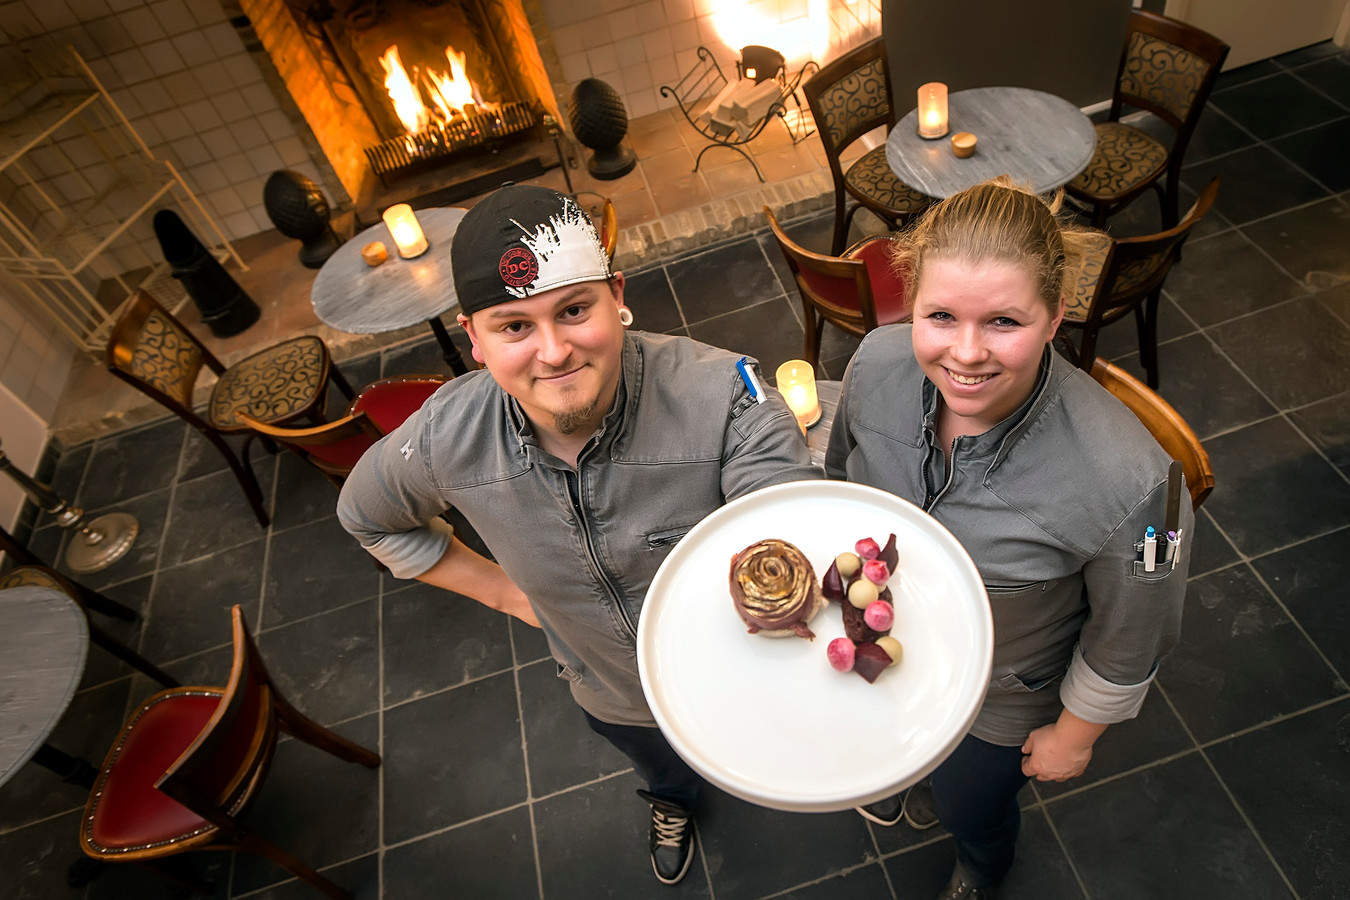 Timothy Ravelli en Sanne Fikke zwaaien de scepter over de keuken.